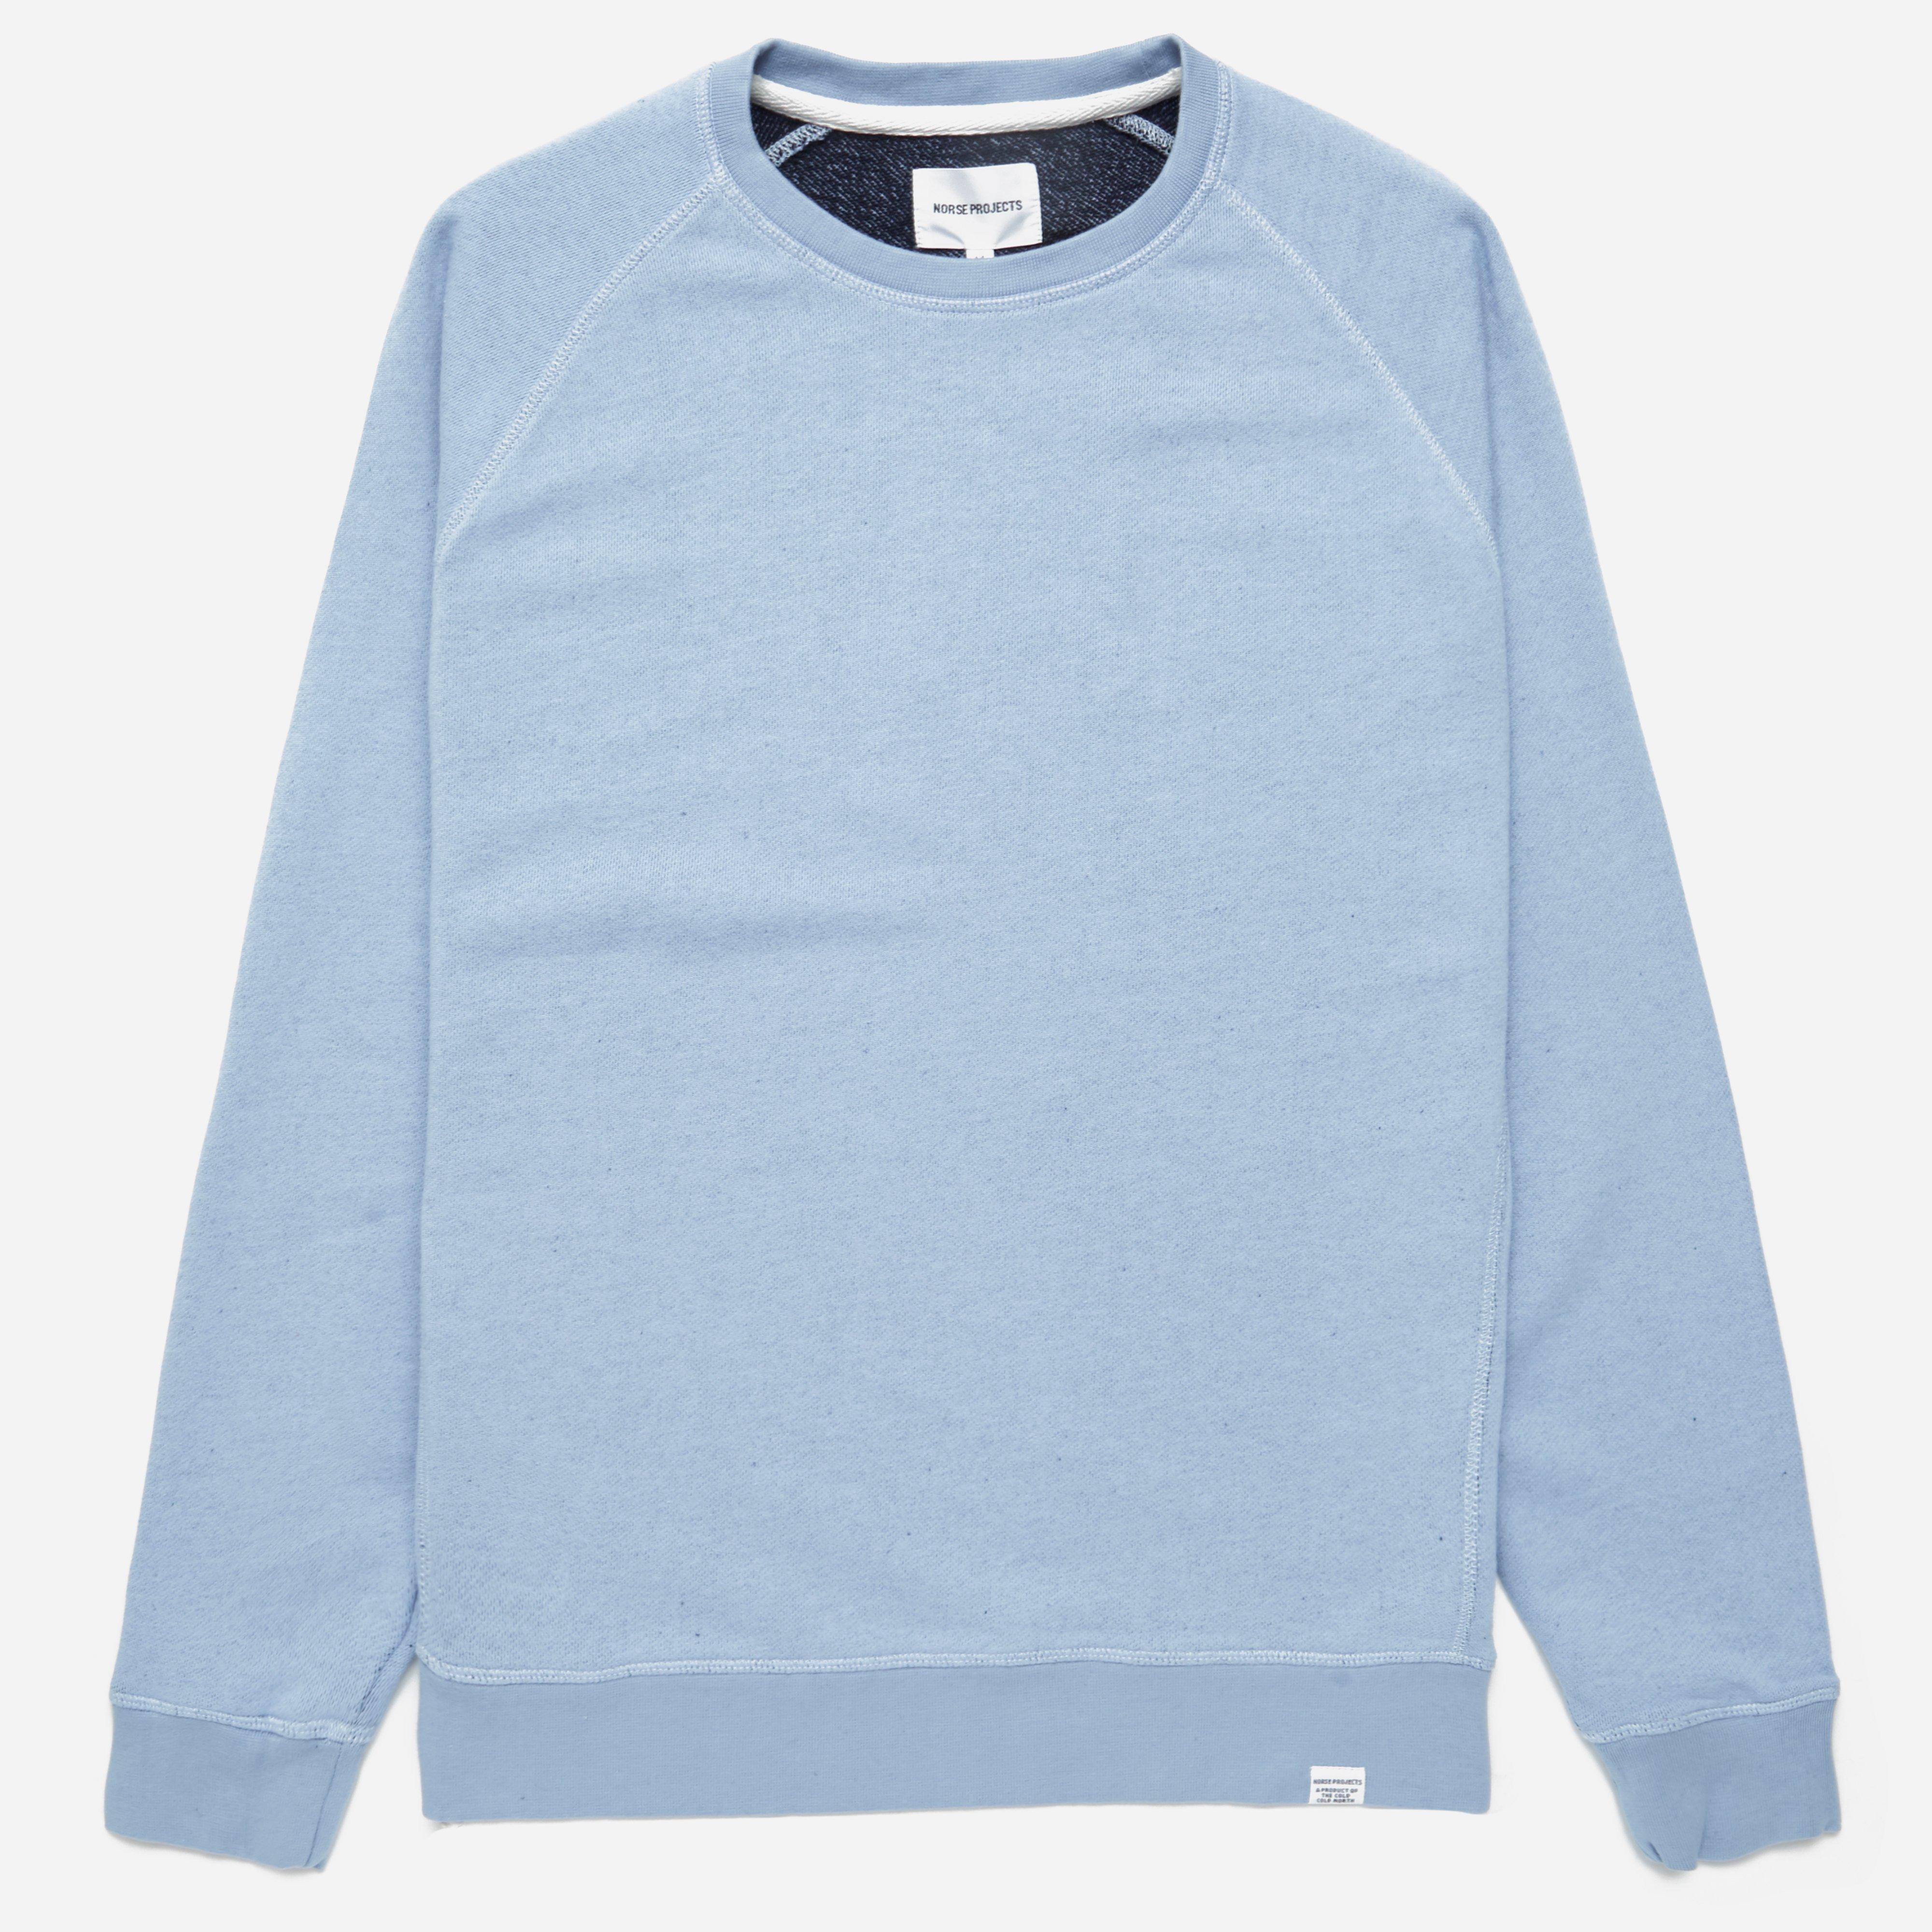 Norse Projects Ketel Double Face Sweatshirt